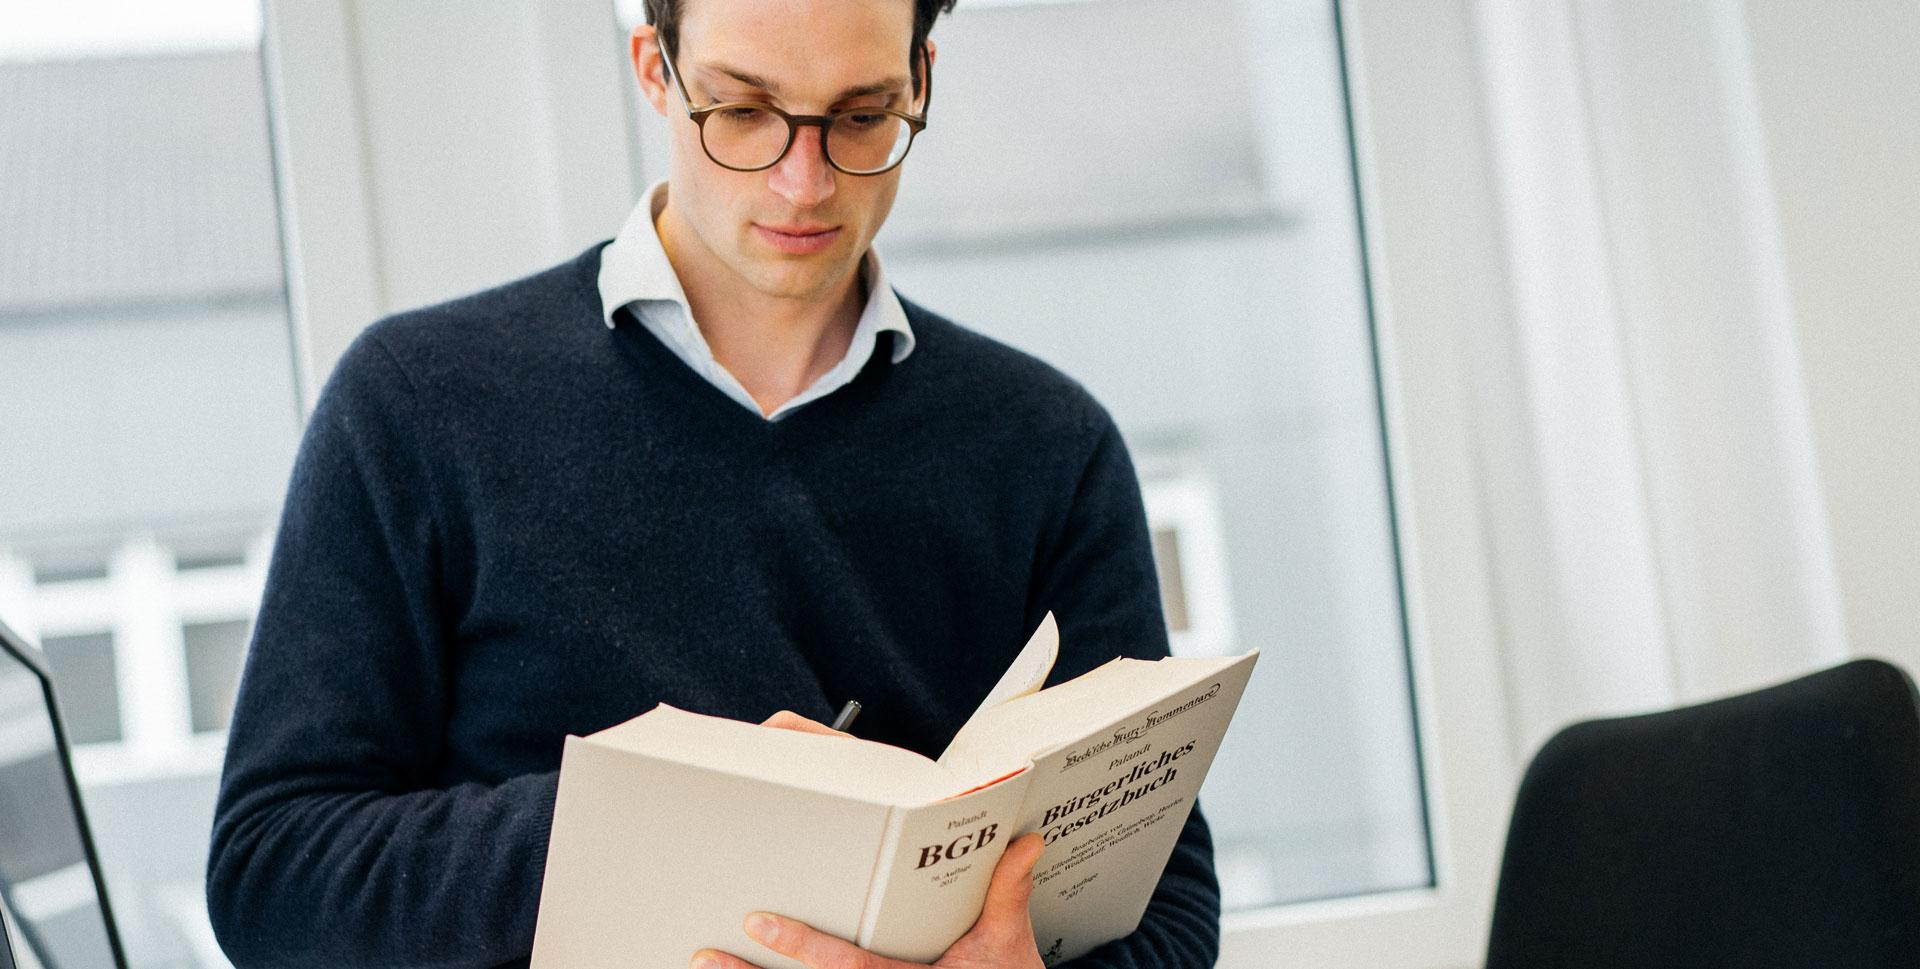 A member of SkySails Legal Department studying the german civil code